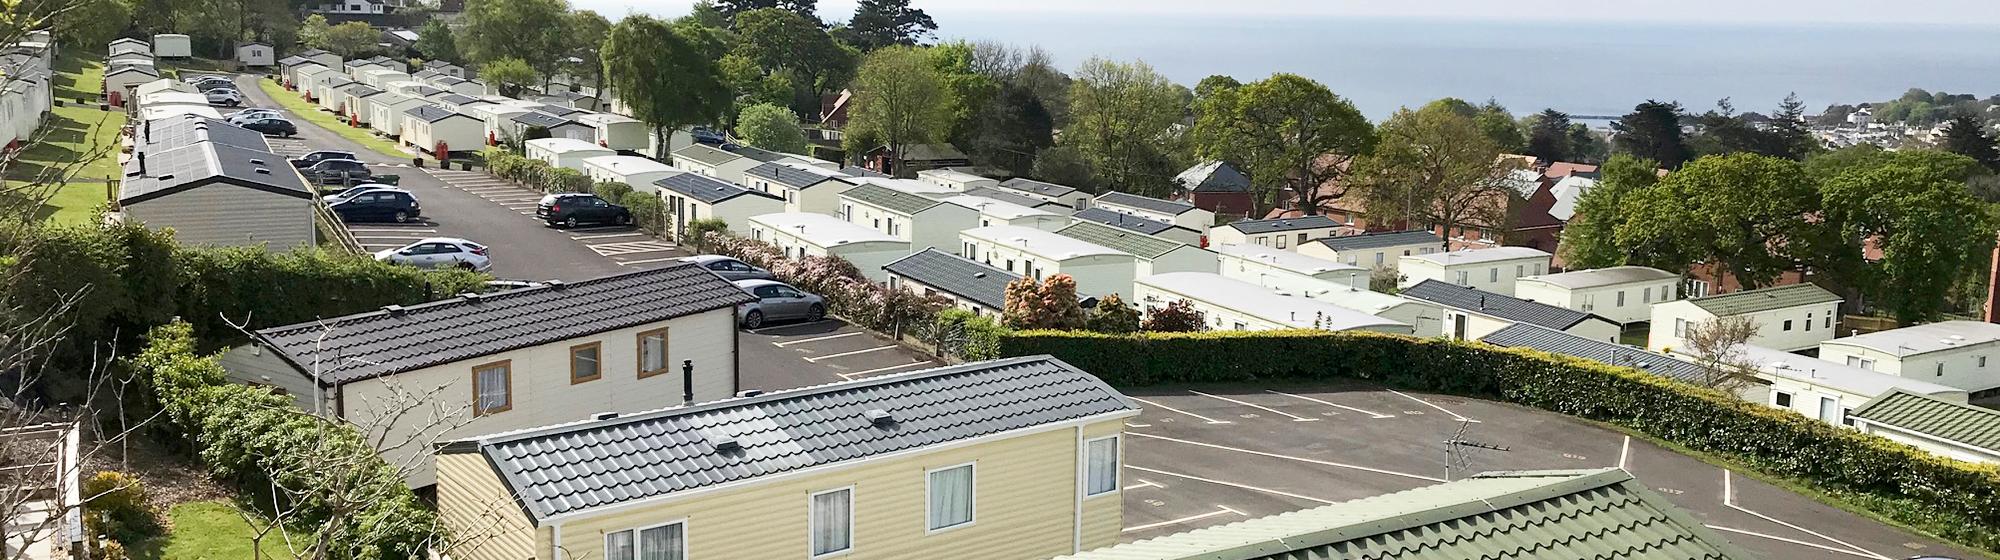 Timber Vale, Slider Image, Lyme Regis, Caravan Park, Campsite, Dorset, Jurassic Coast, Dorset Campsite 9